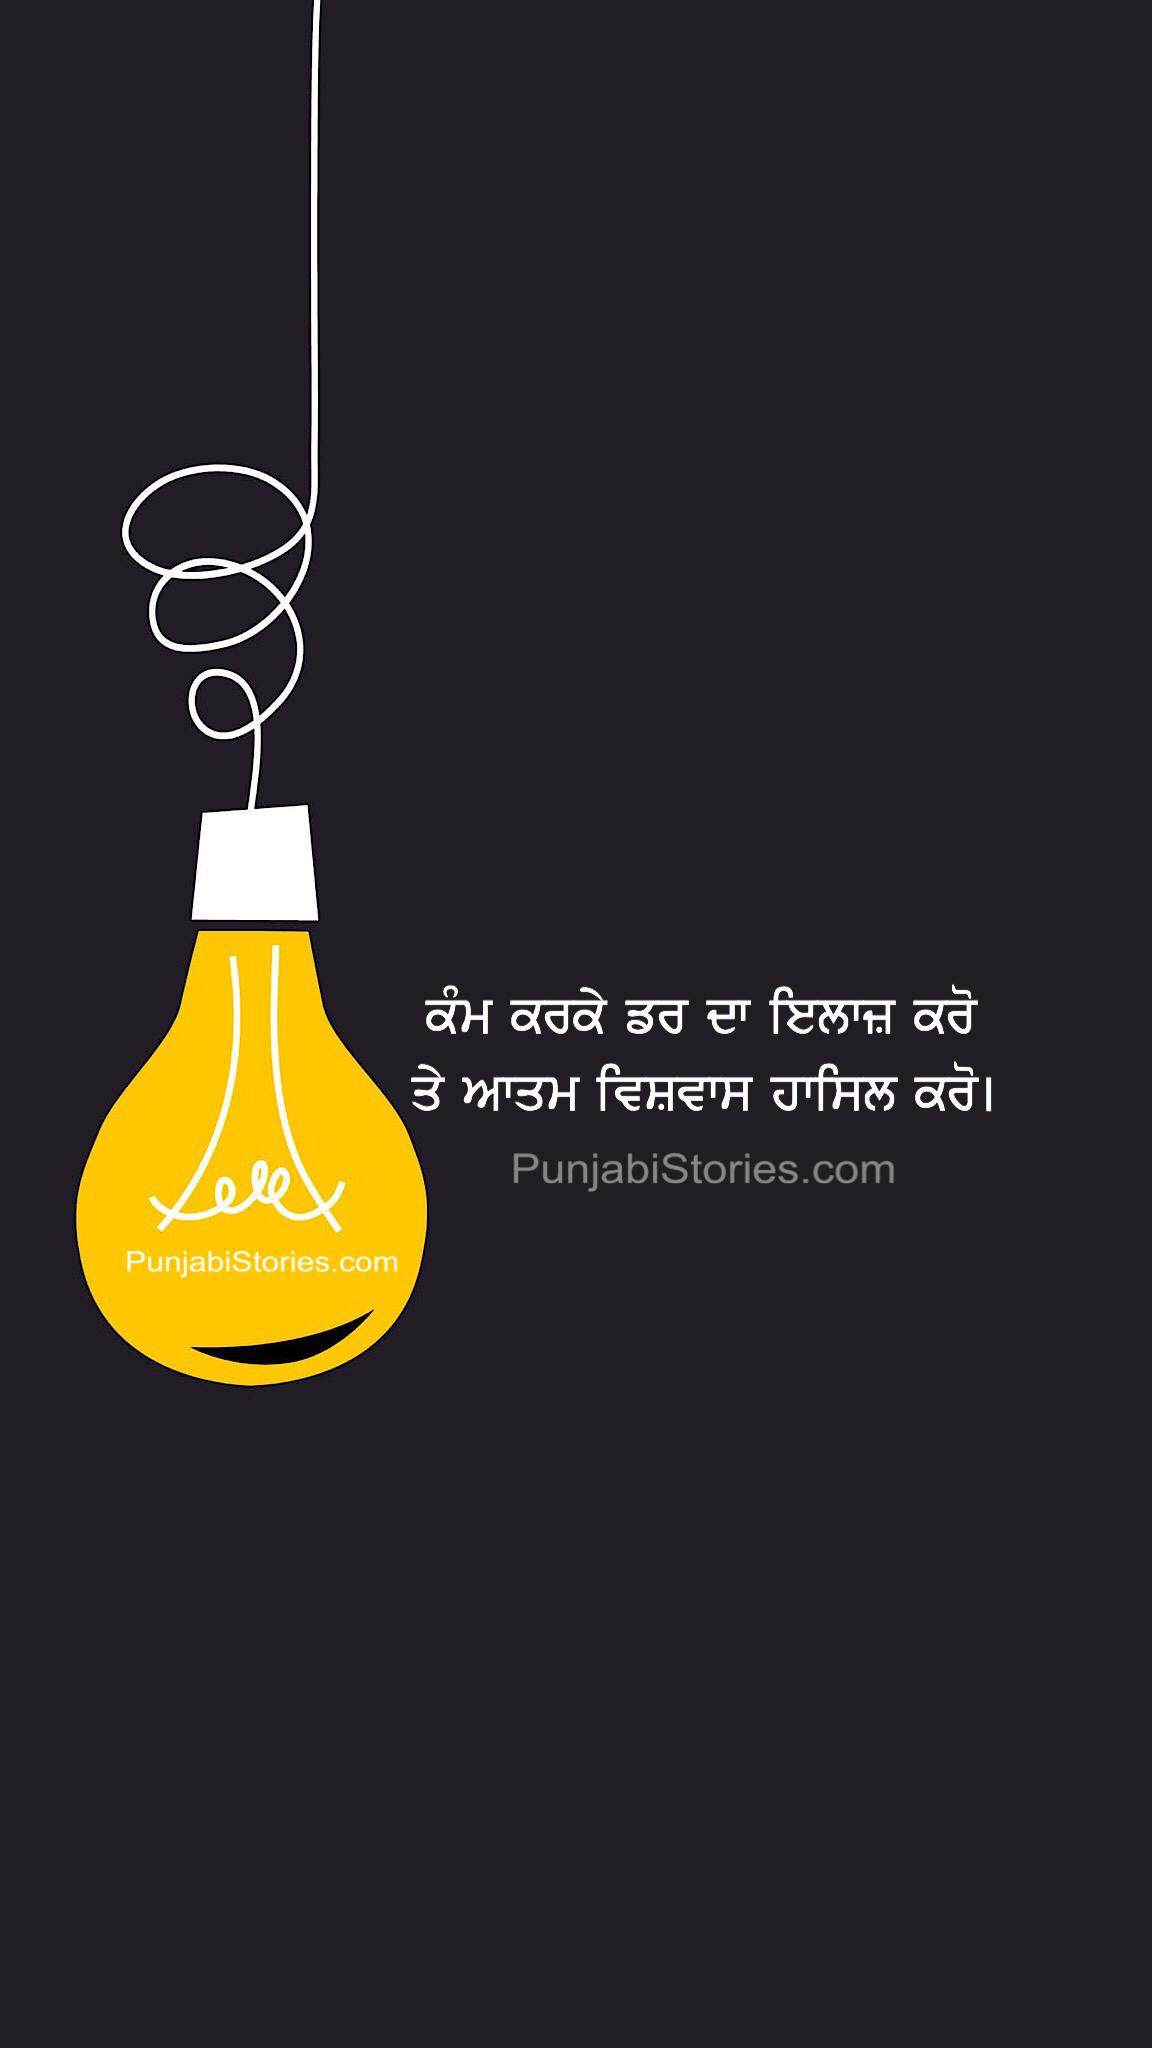 Punjabi Stories - Punjabi Kahania, Boliyan, Shayari and